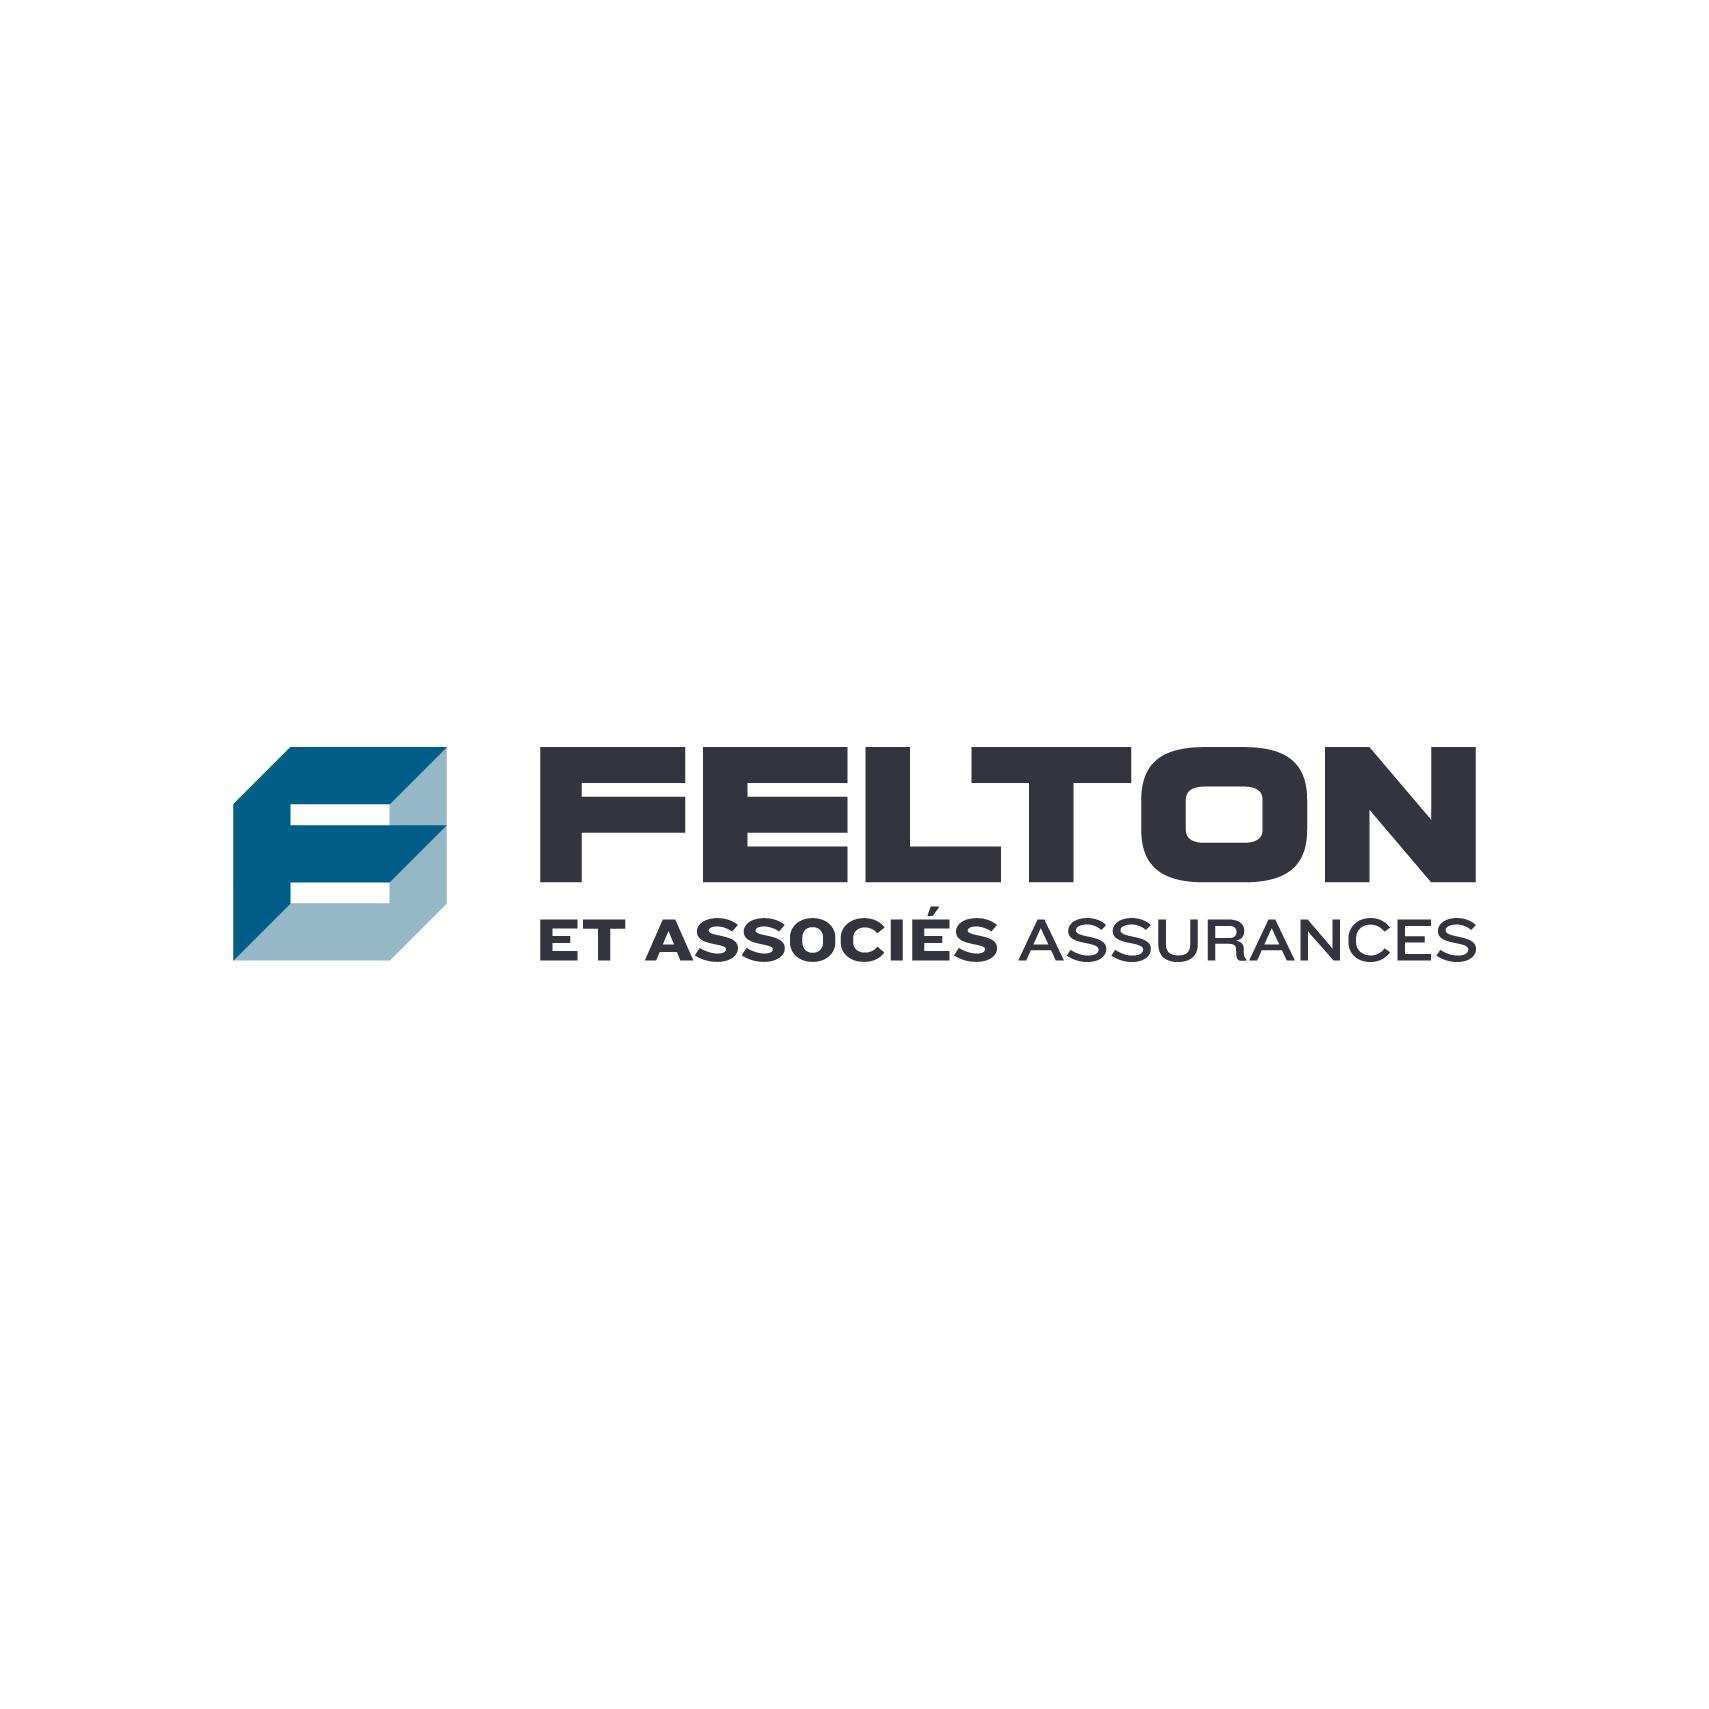 MlleRouge_logos_FeltonAssurances